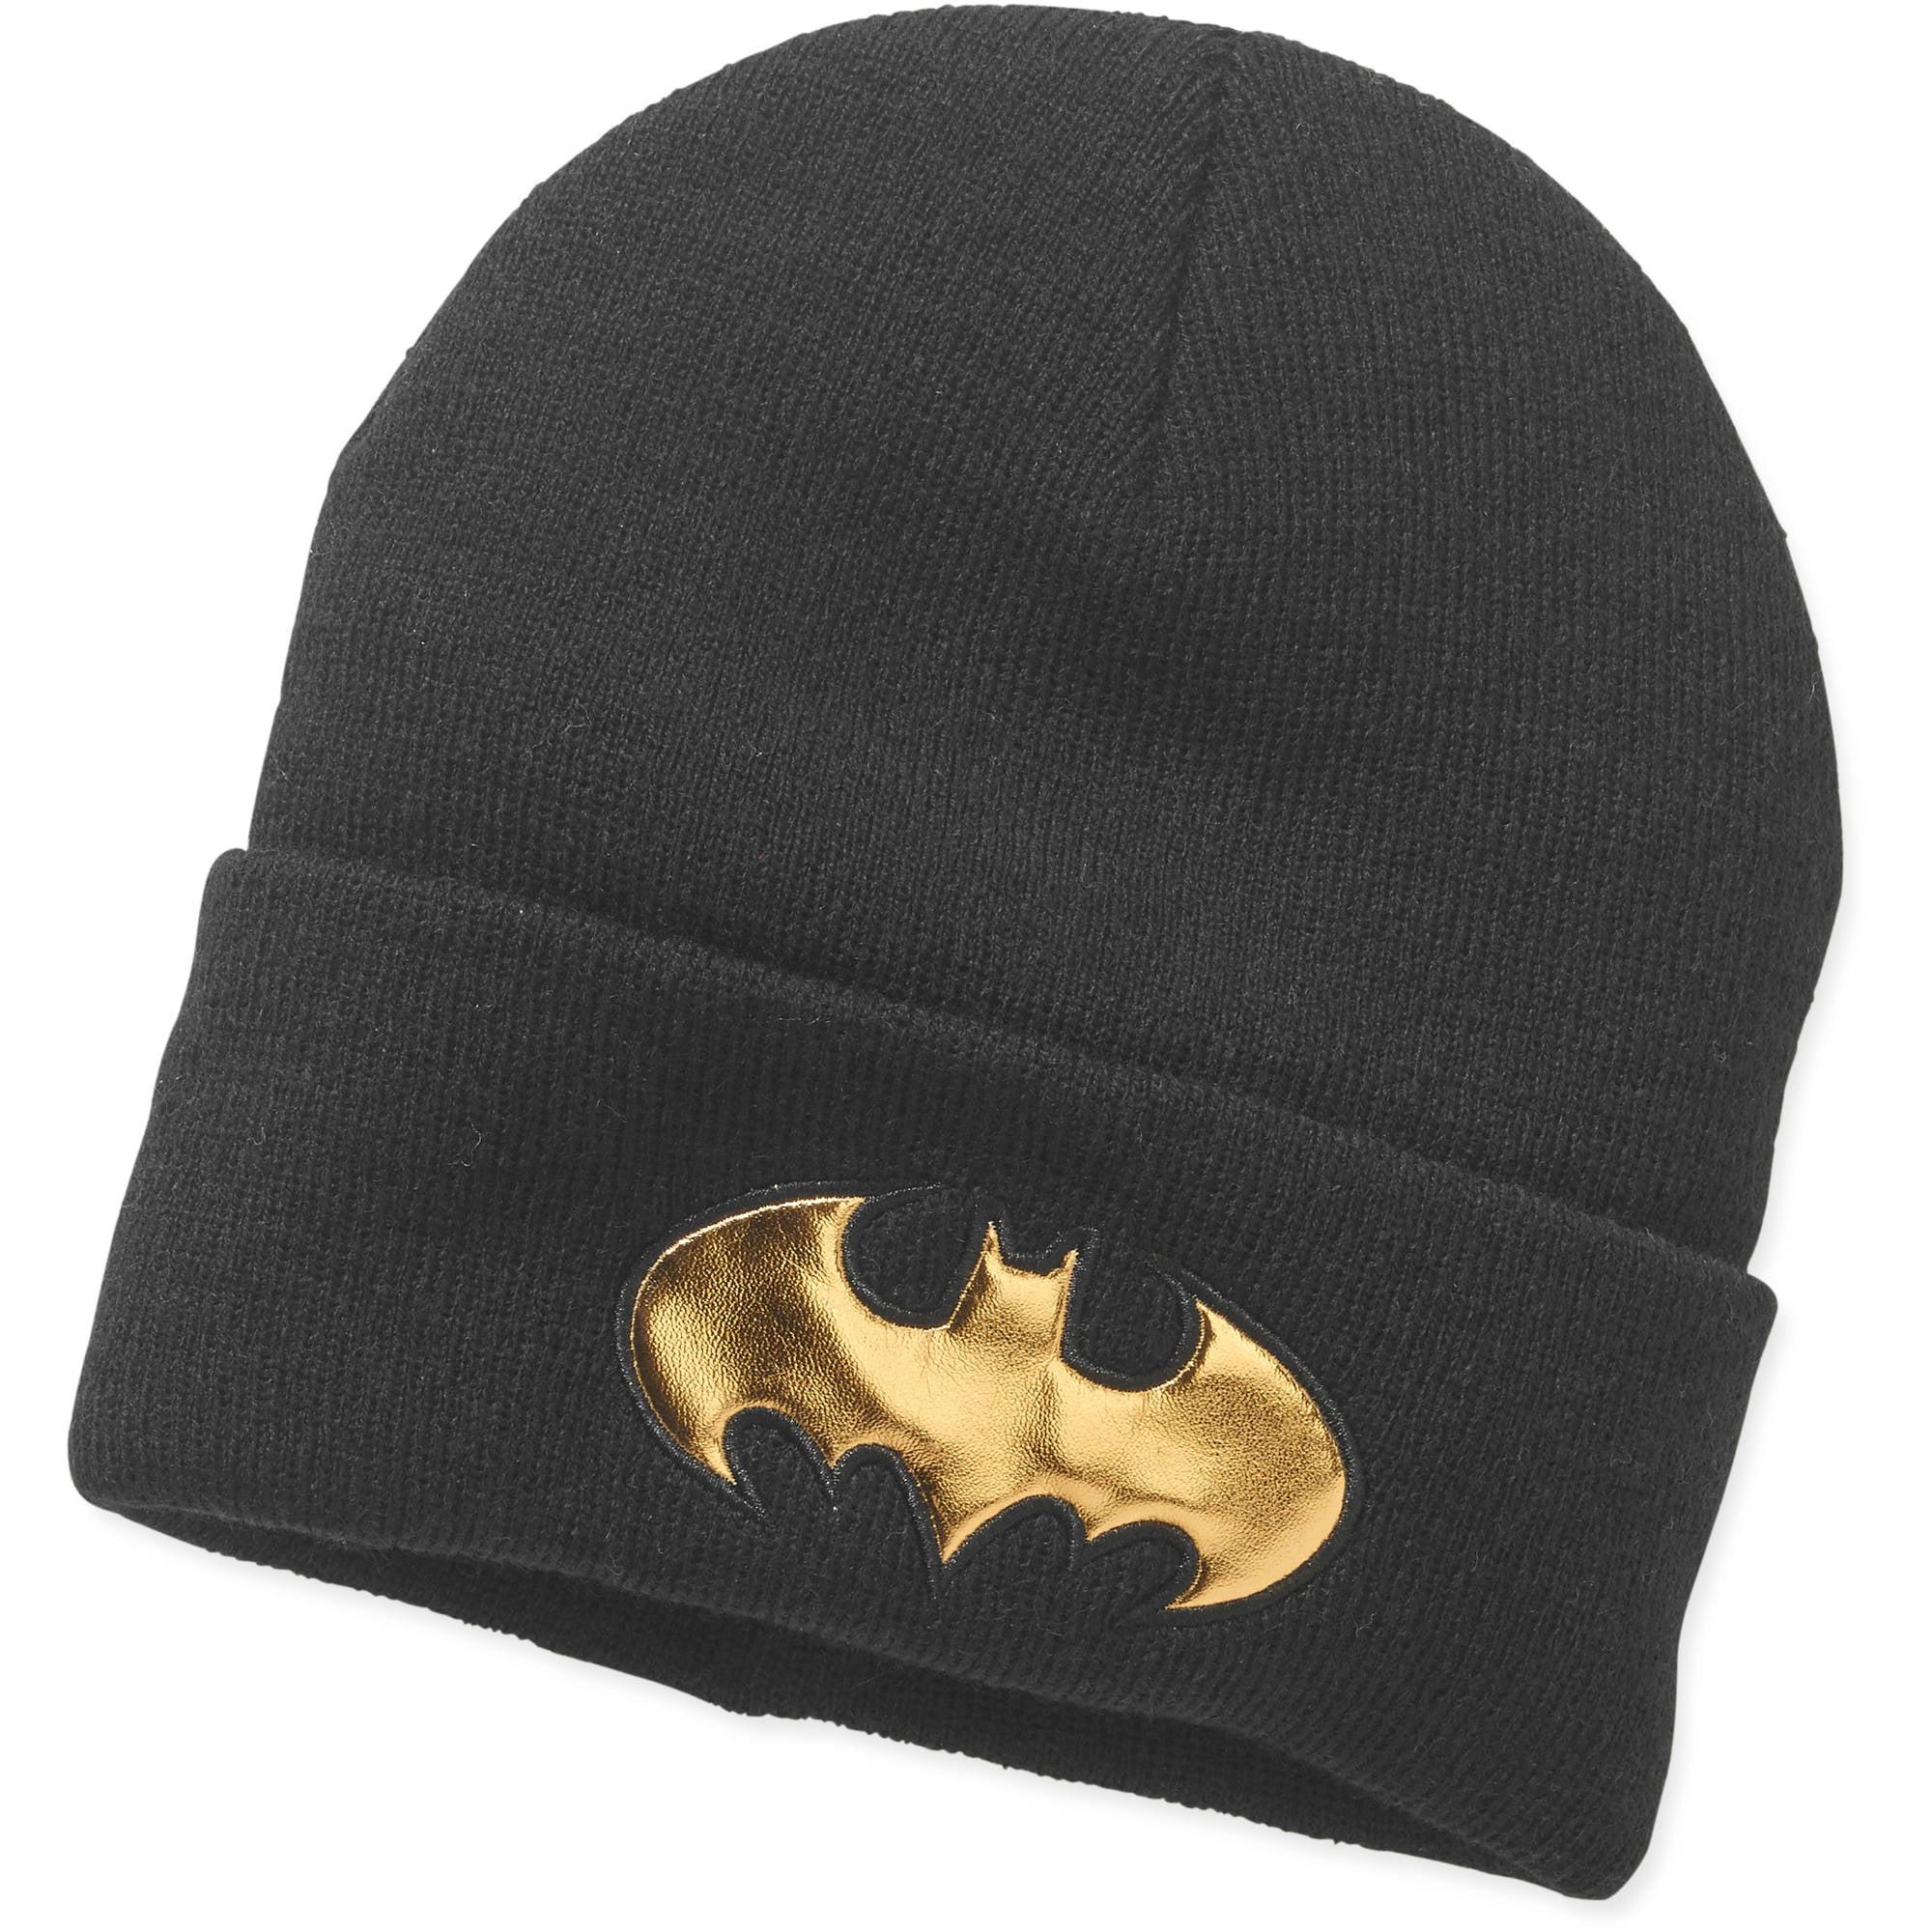 Women's Batman Gold Icon Cuff Knit Hat